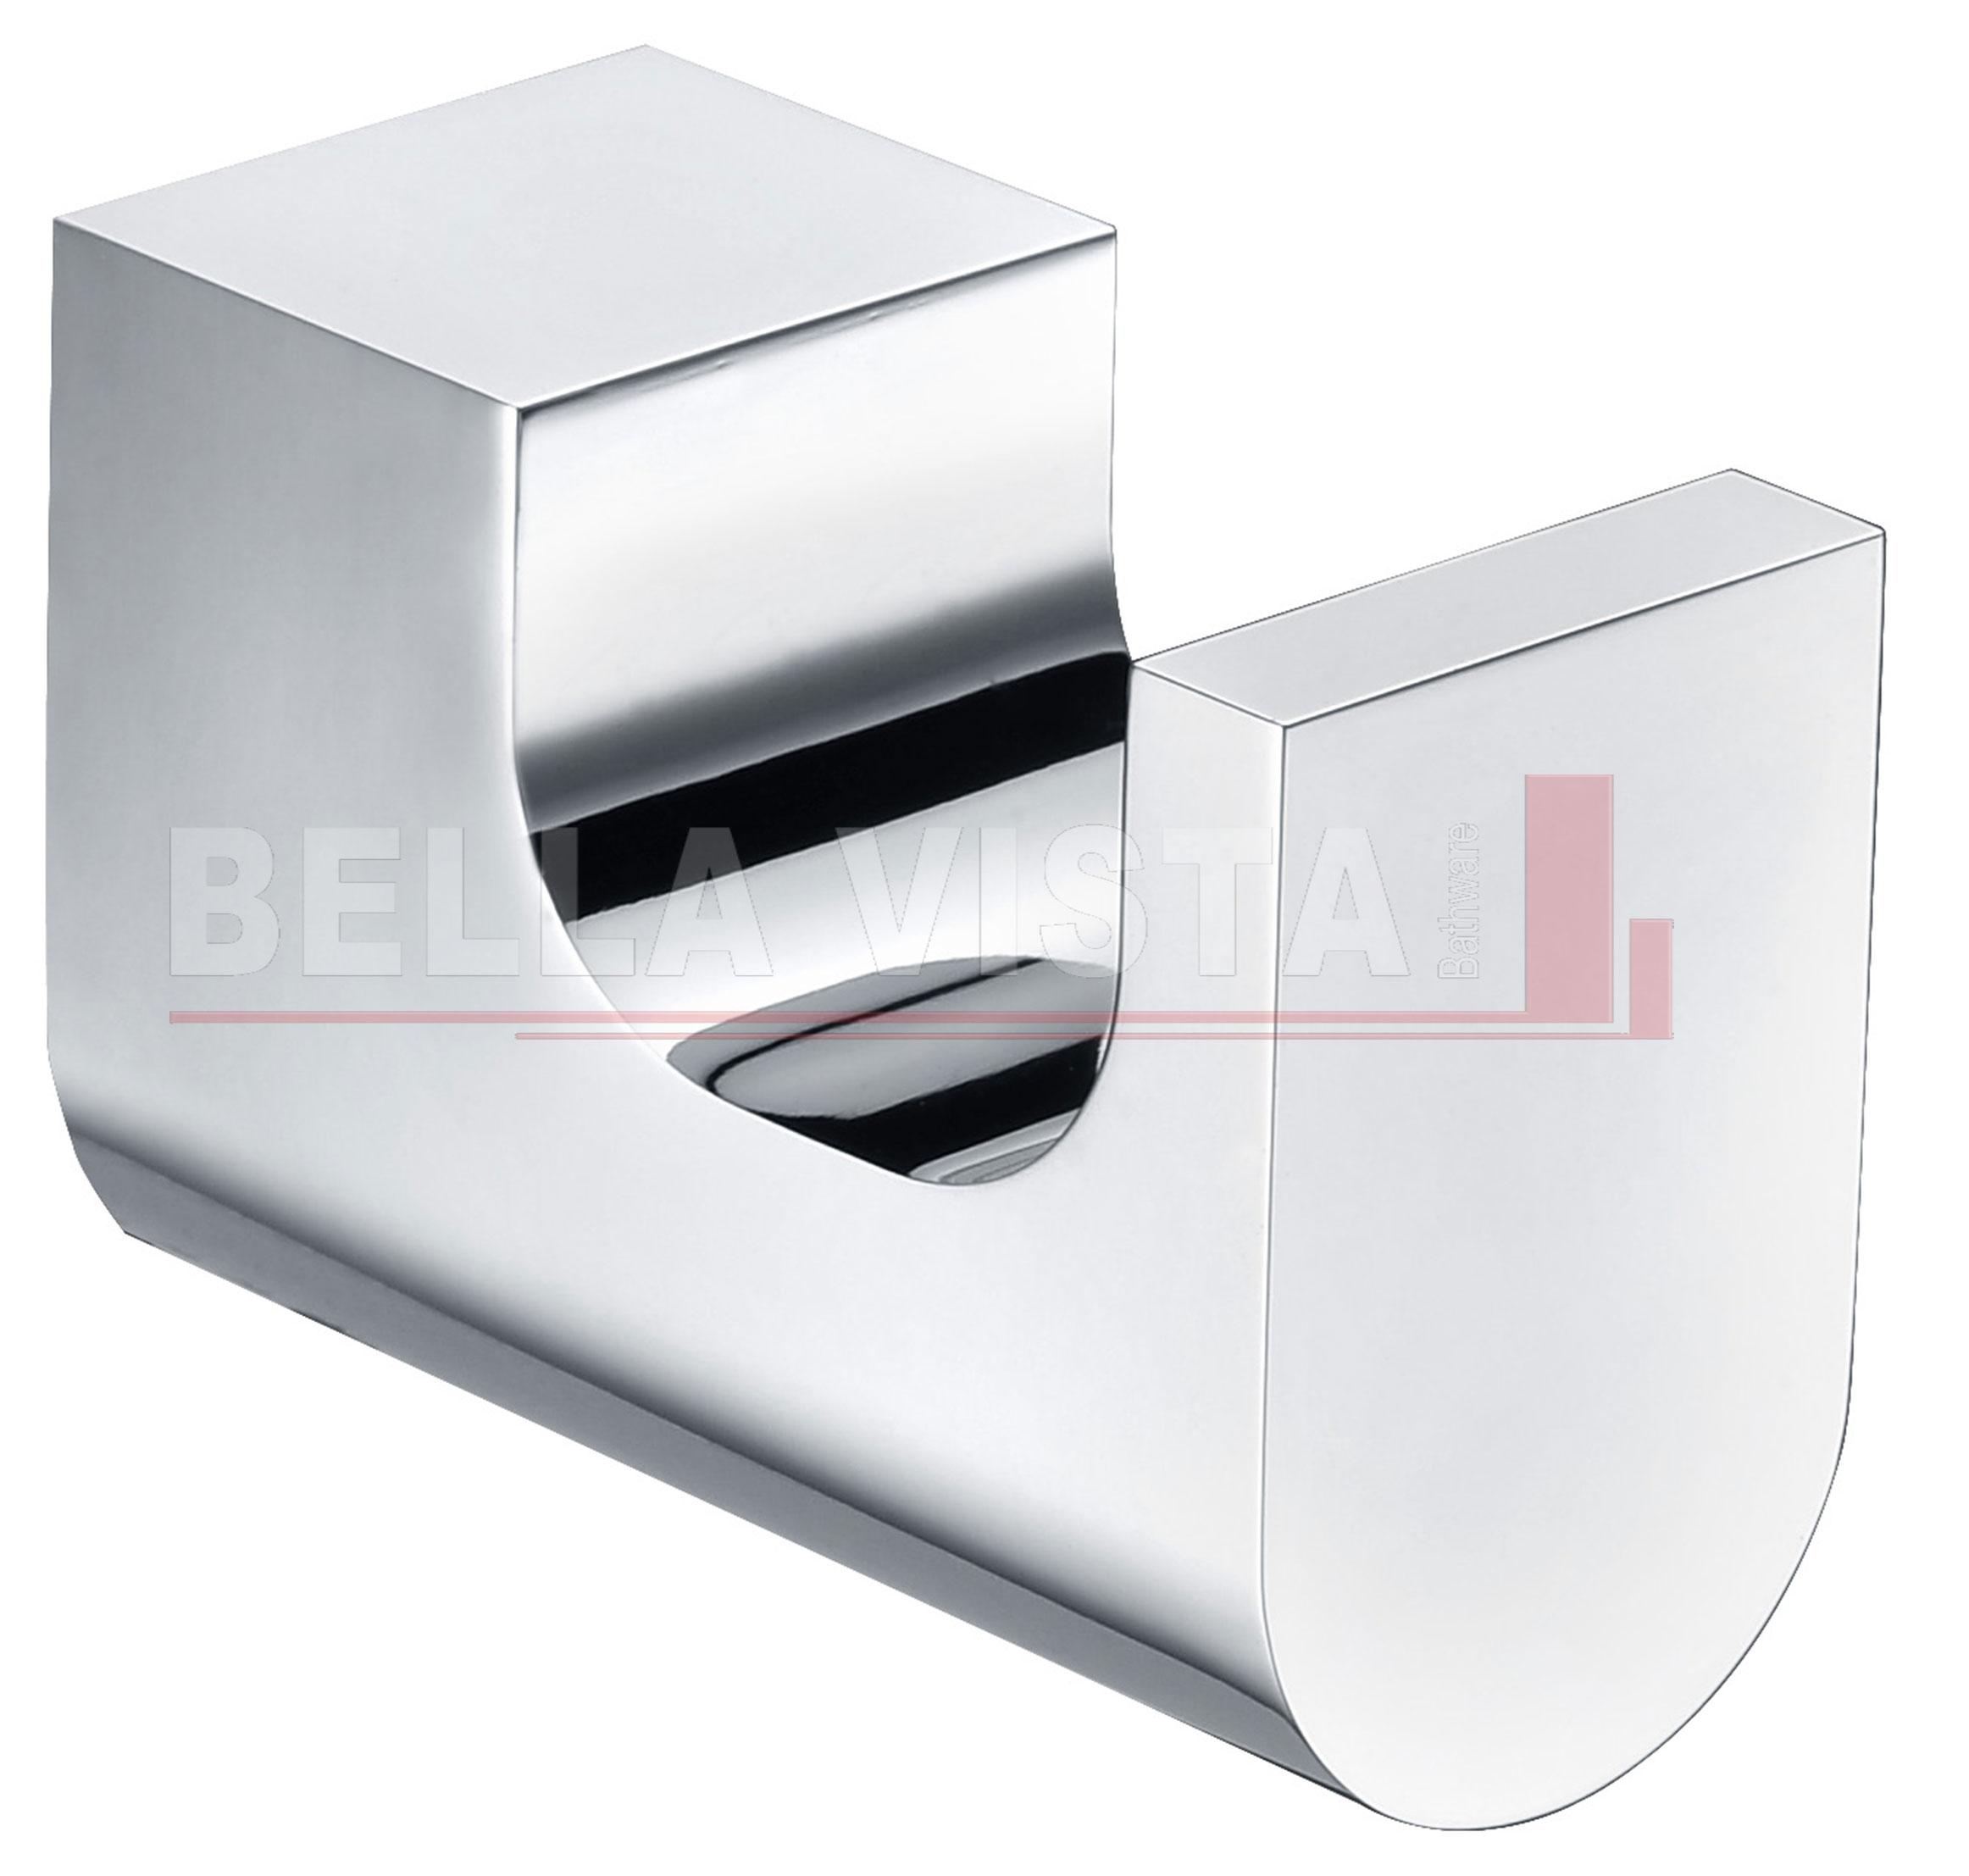 Bathware Direct BathwareDirect  Twitter